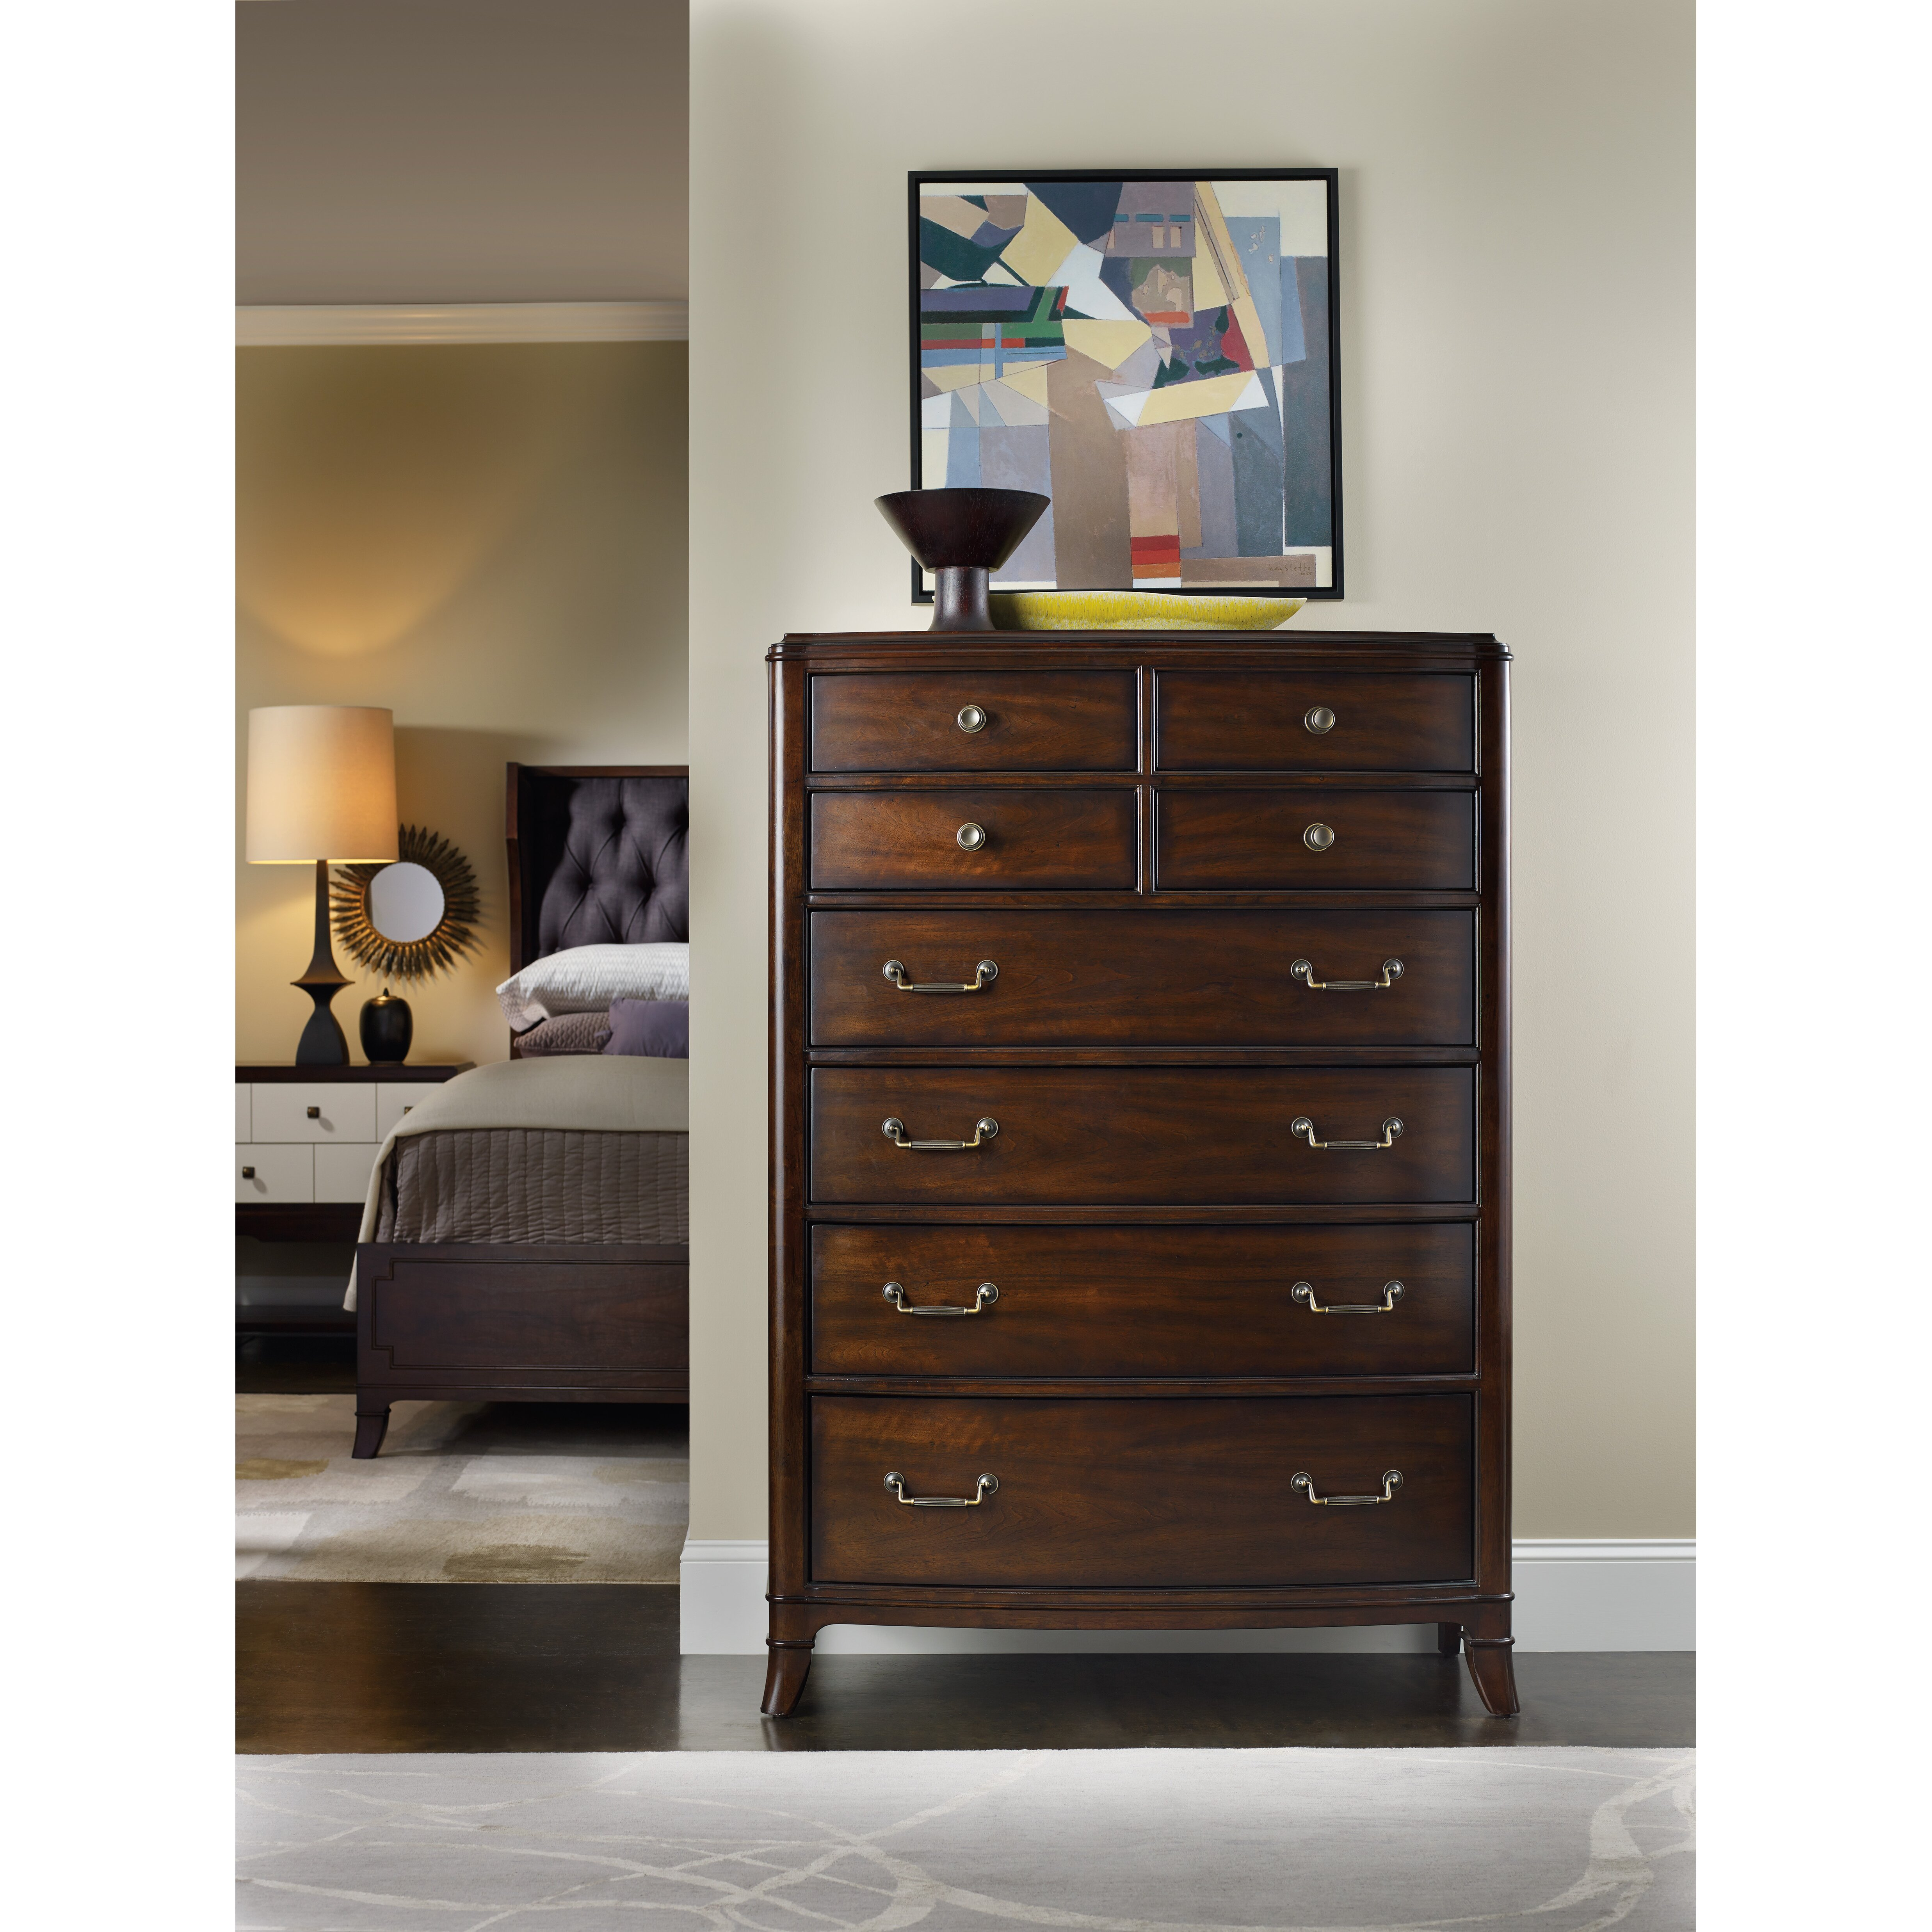 Hooker Furniture Palisade 8 Drawer Chest Reviews Wayfair